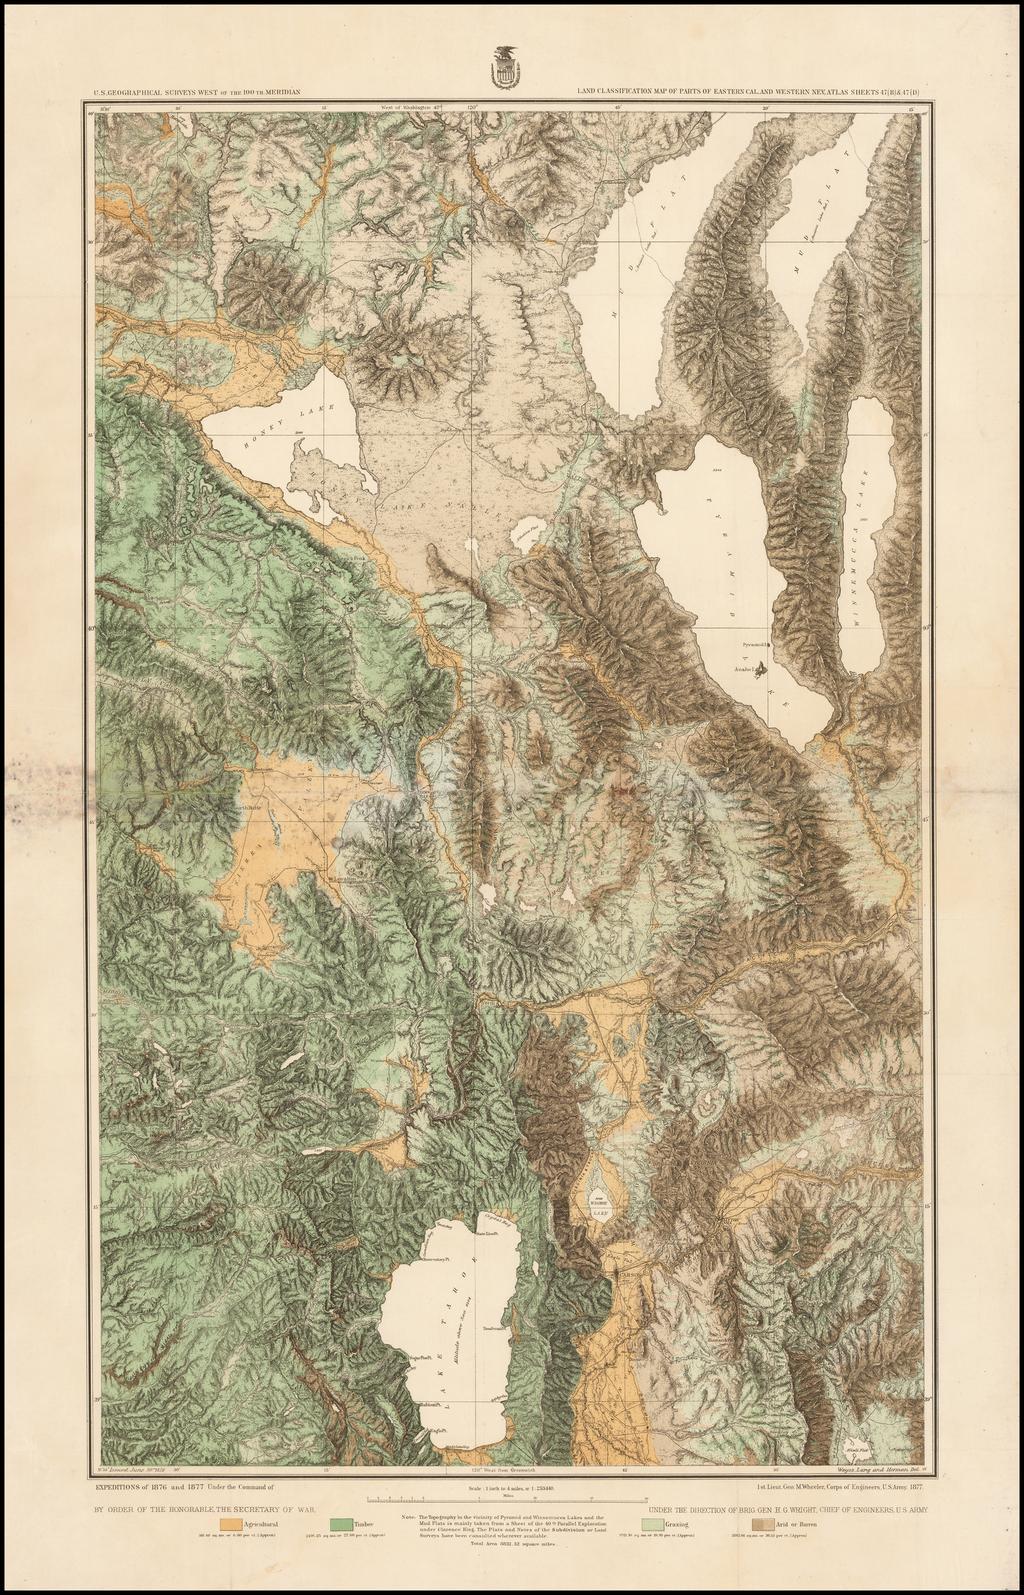 Land Classification Map of Parts of Eastern California and Western Nevada . . .  [Lake Tahoe, Reno, Carson, Astor Pass, Honey Lake & Pyramid Lake] By George M. Wheeler